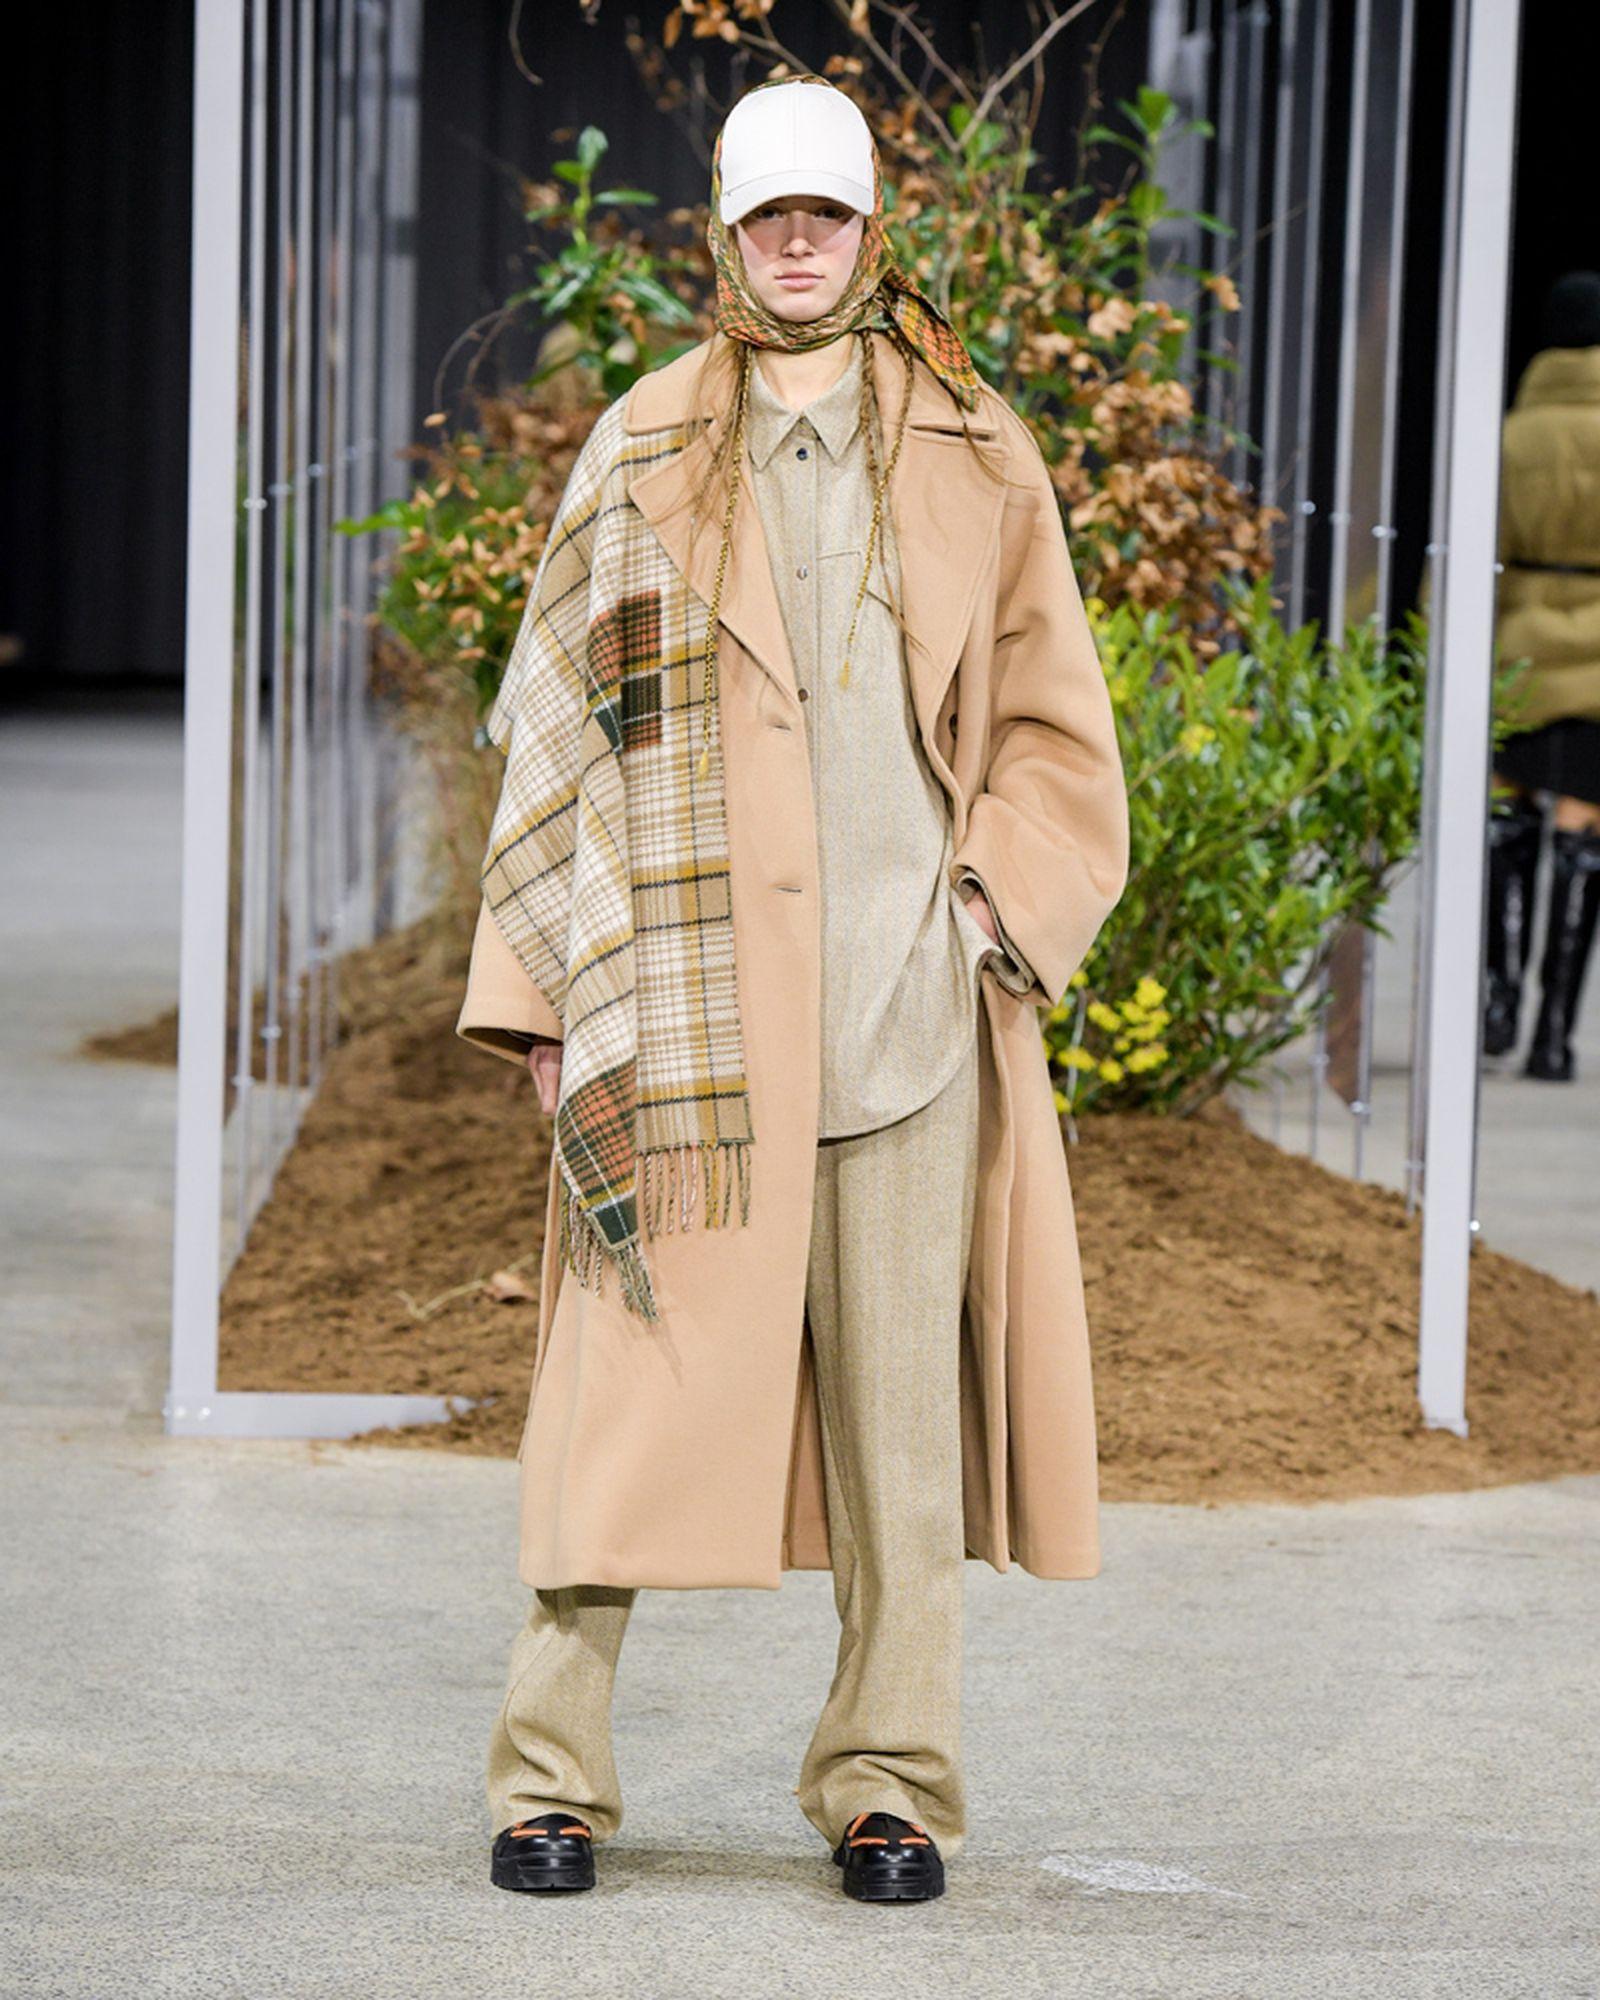 future-fashion-week-copenhagen-holz-7